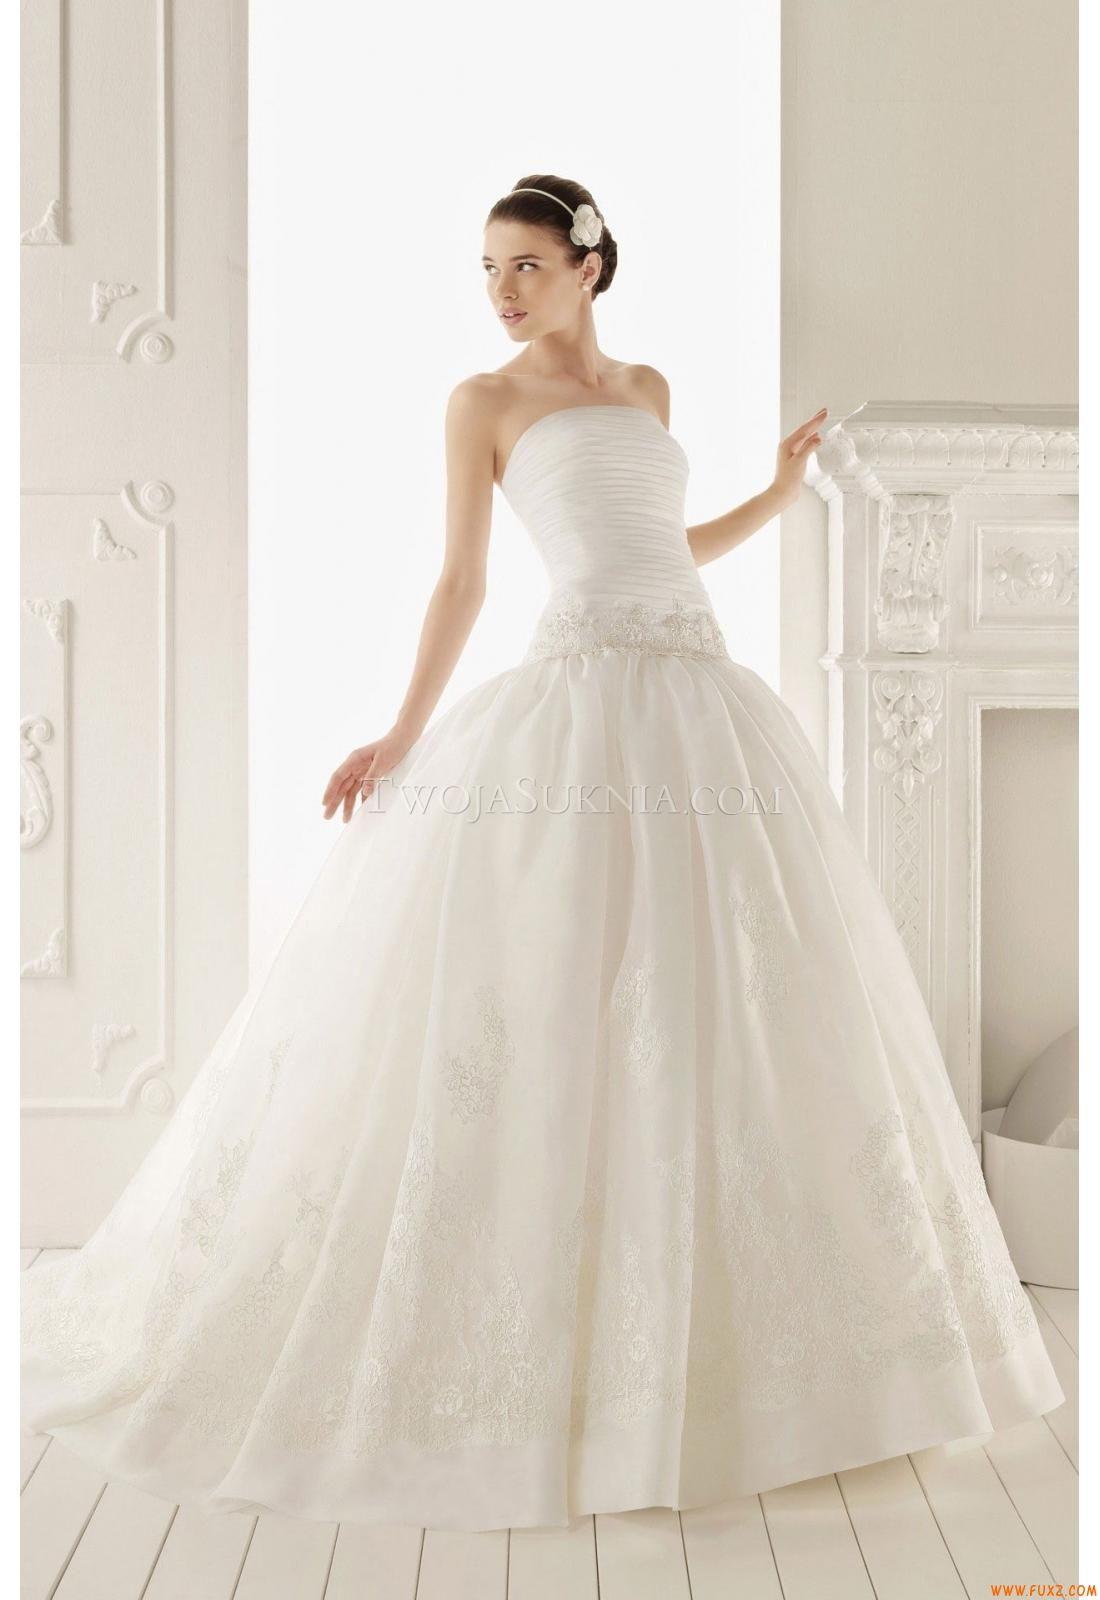 Wedding Dresses Aire Barcelona 121 Rebeca 2013 Ball Gowns Wedding Wedding Dresses 2014 Ball Gown Wedding Dress [ 1600 x 1100 Pixel ]